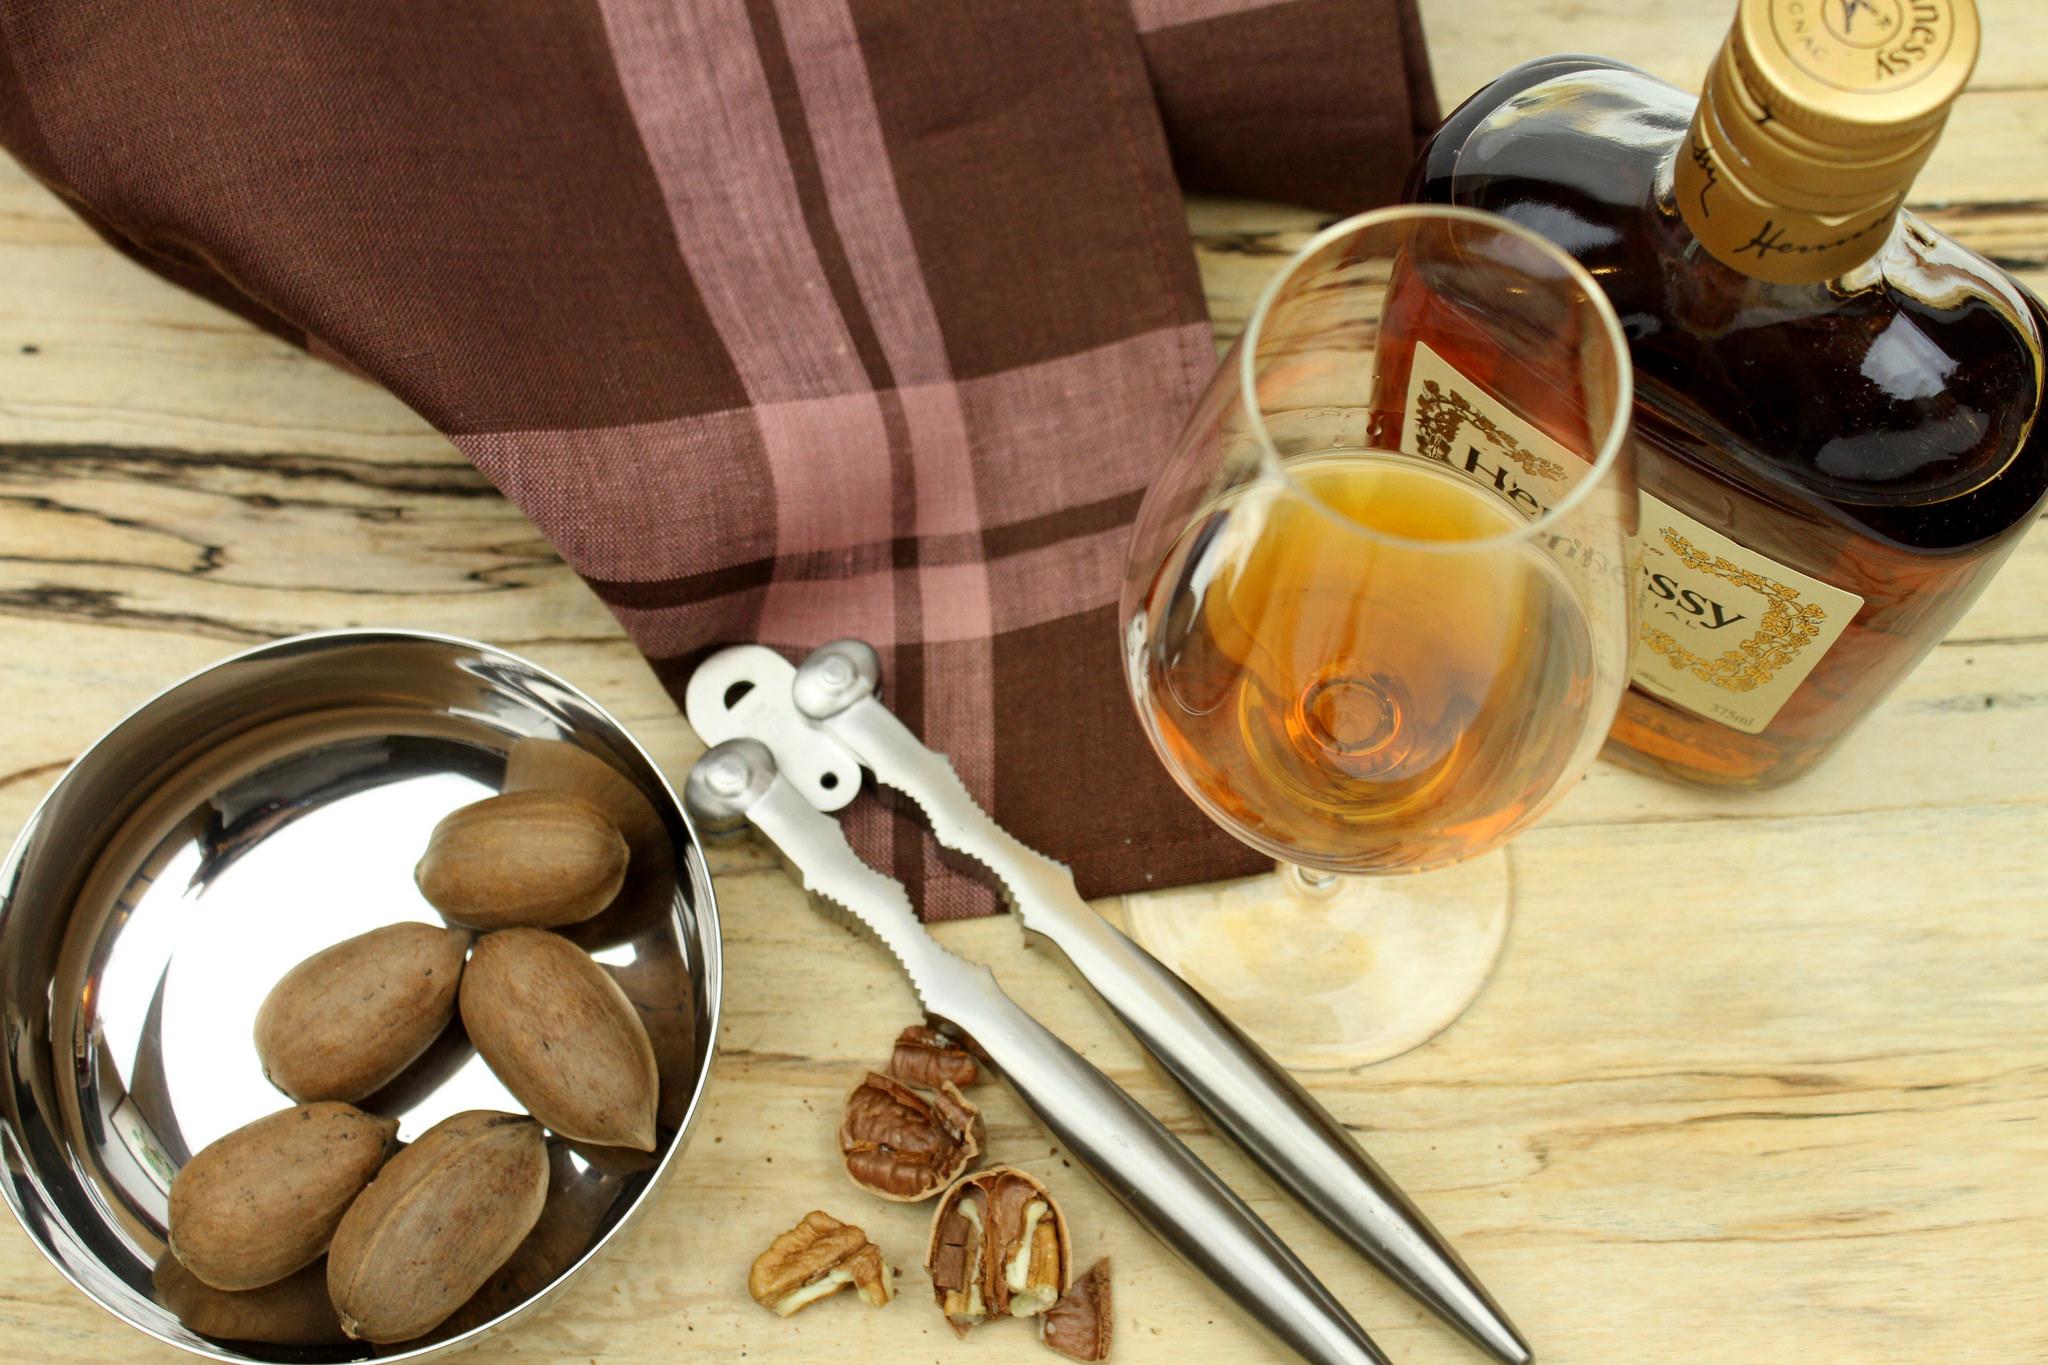 Alessi  nut cracker , Schott Zwiesel  Enoteca Cognac glass , Libeco Home Hudson tea towel,  Spencer Peterman spalted board